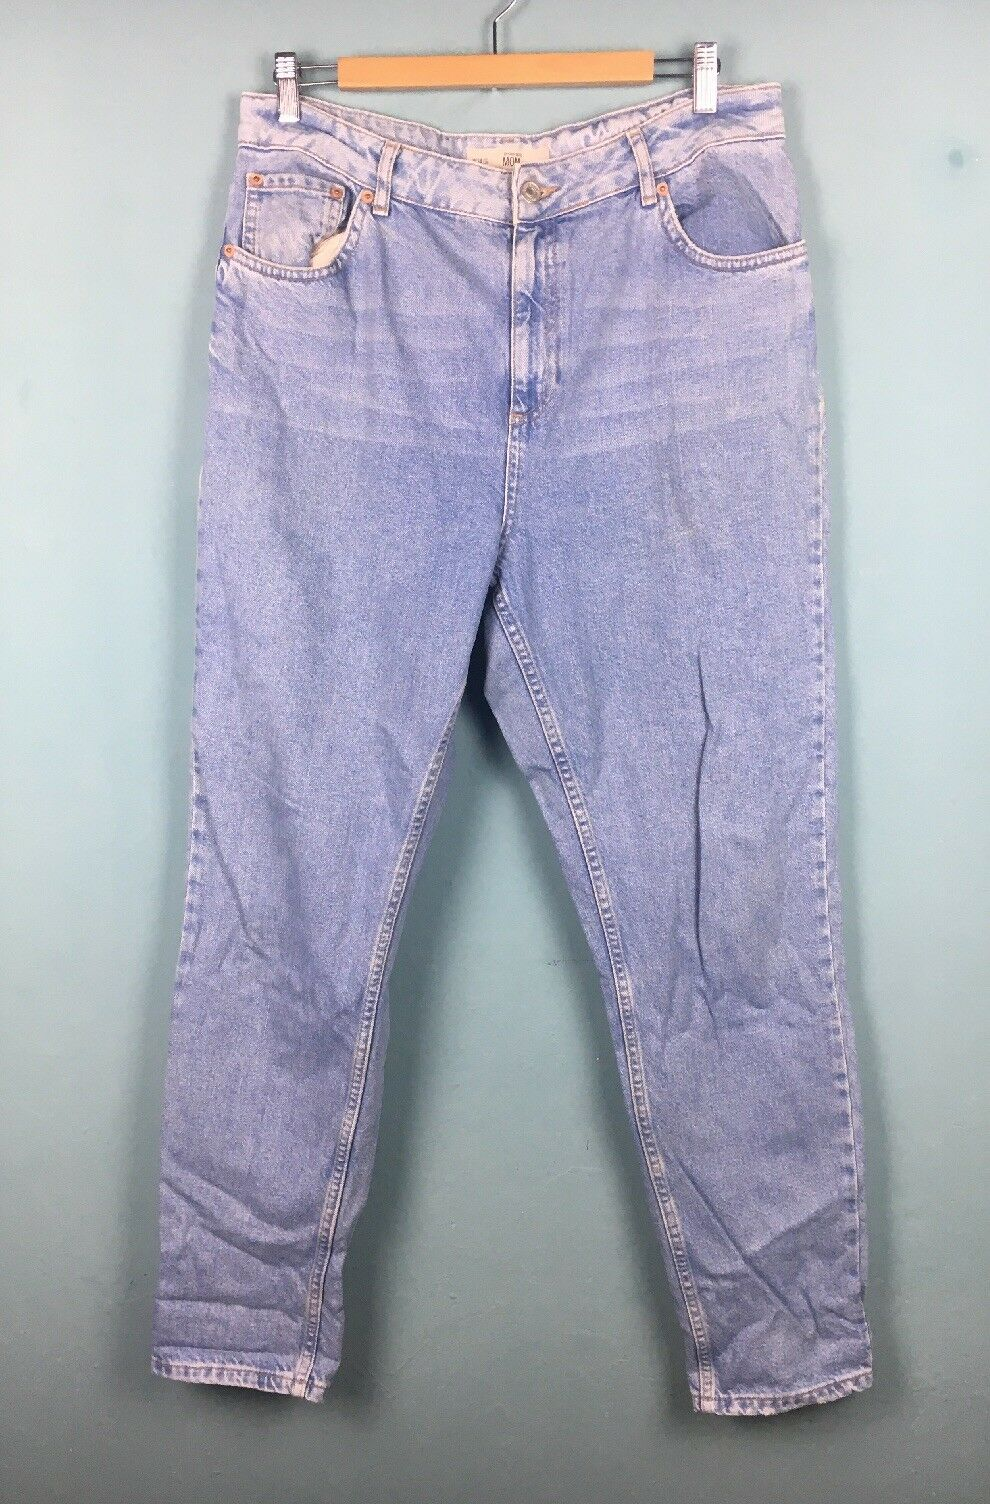 Topshop bluee Retro Vintage Style Mom Jeans W34 L30 16 - B57